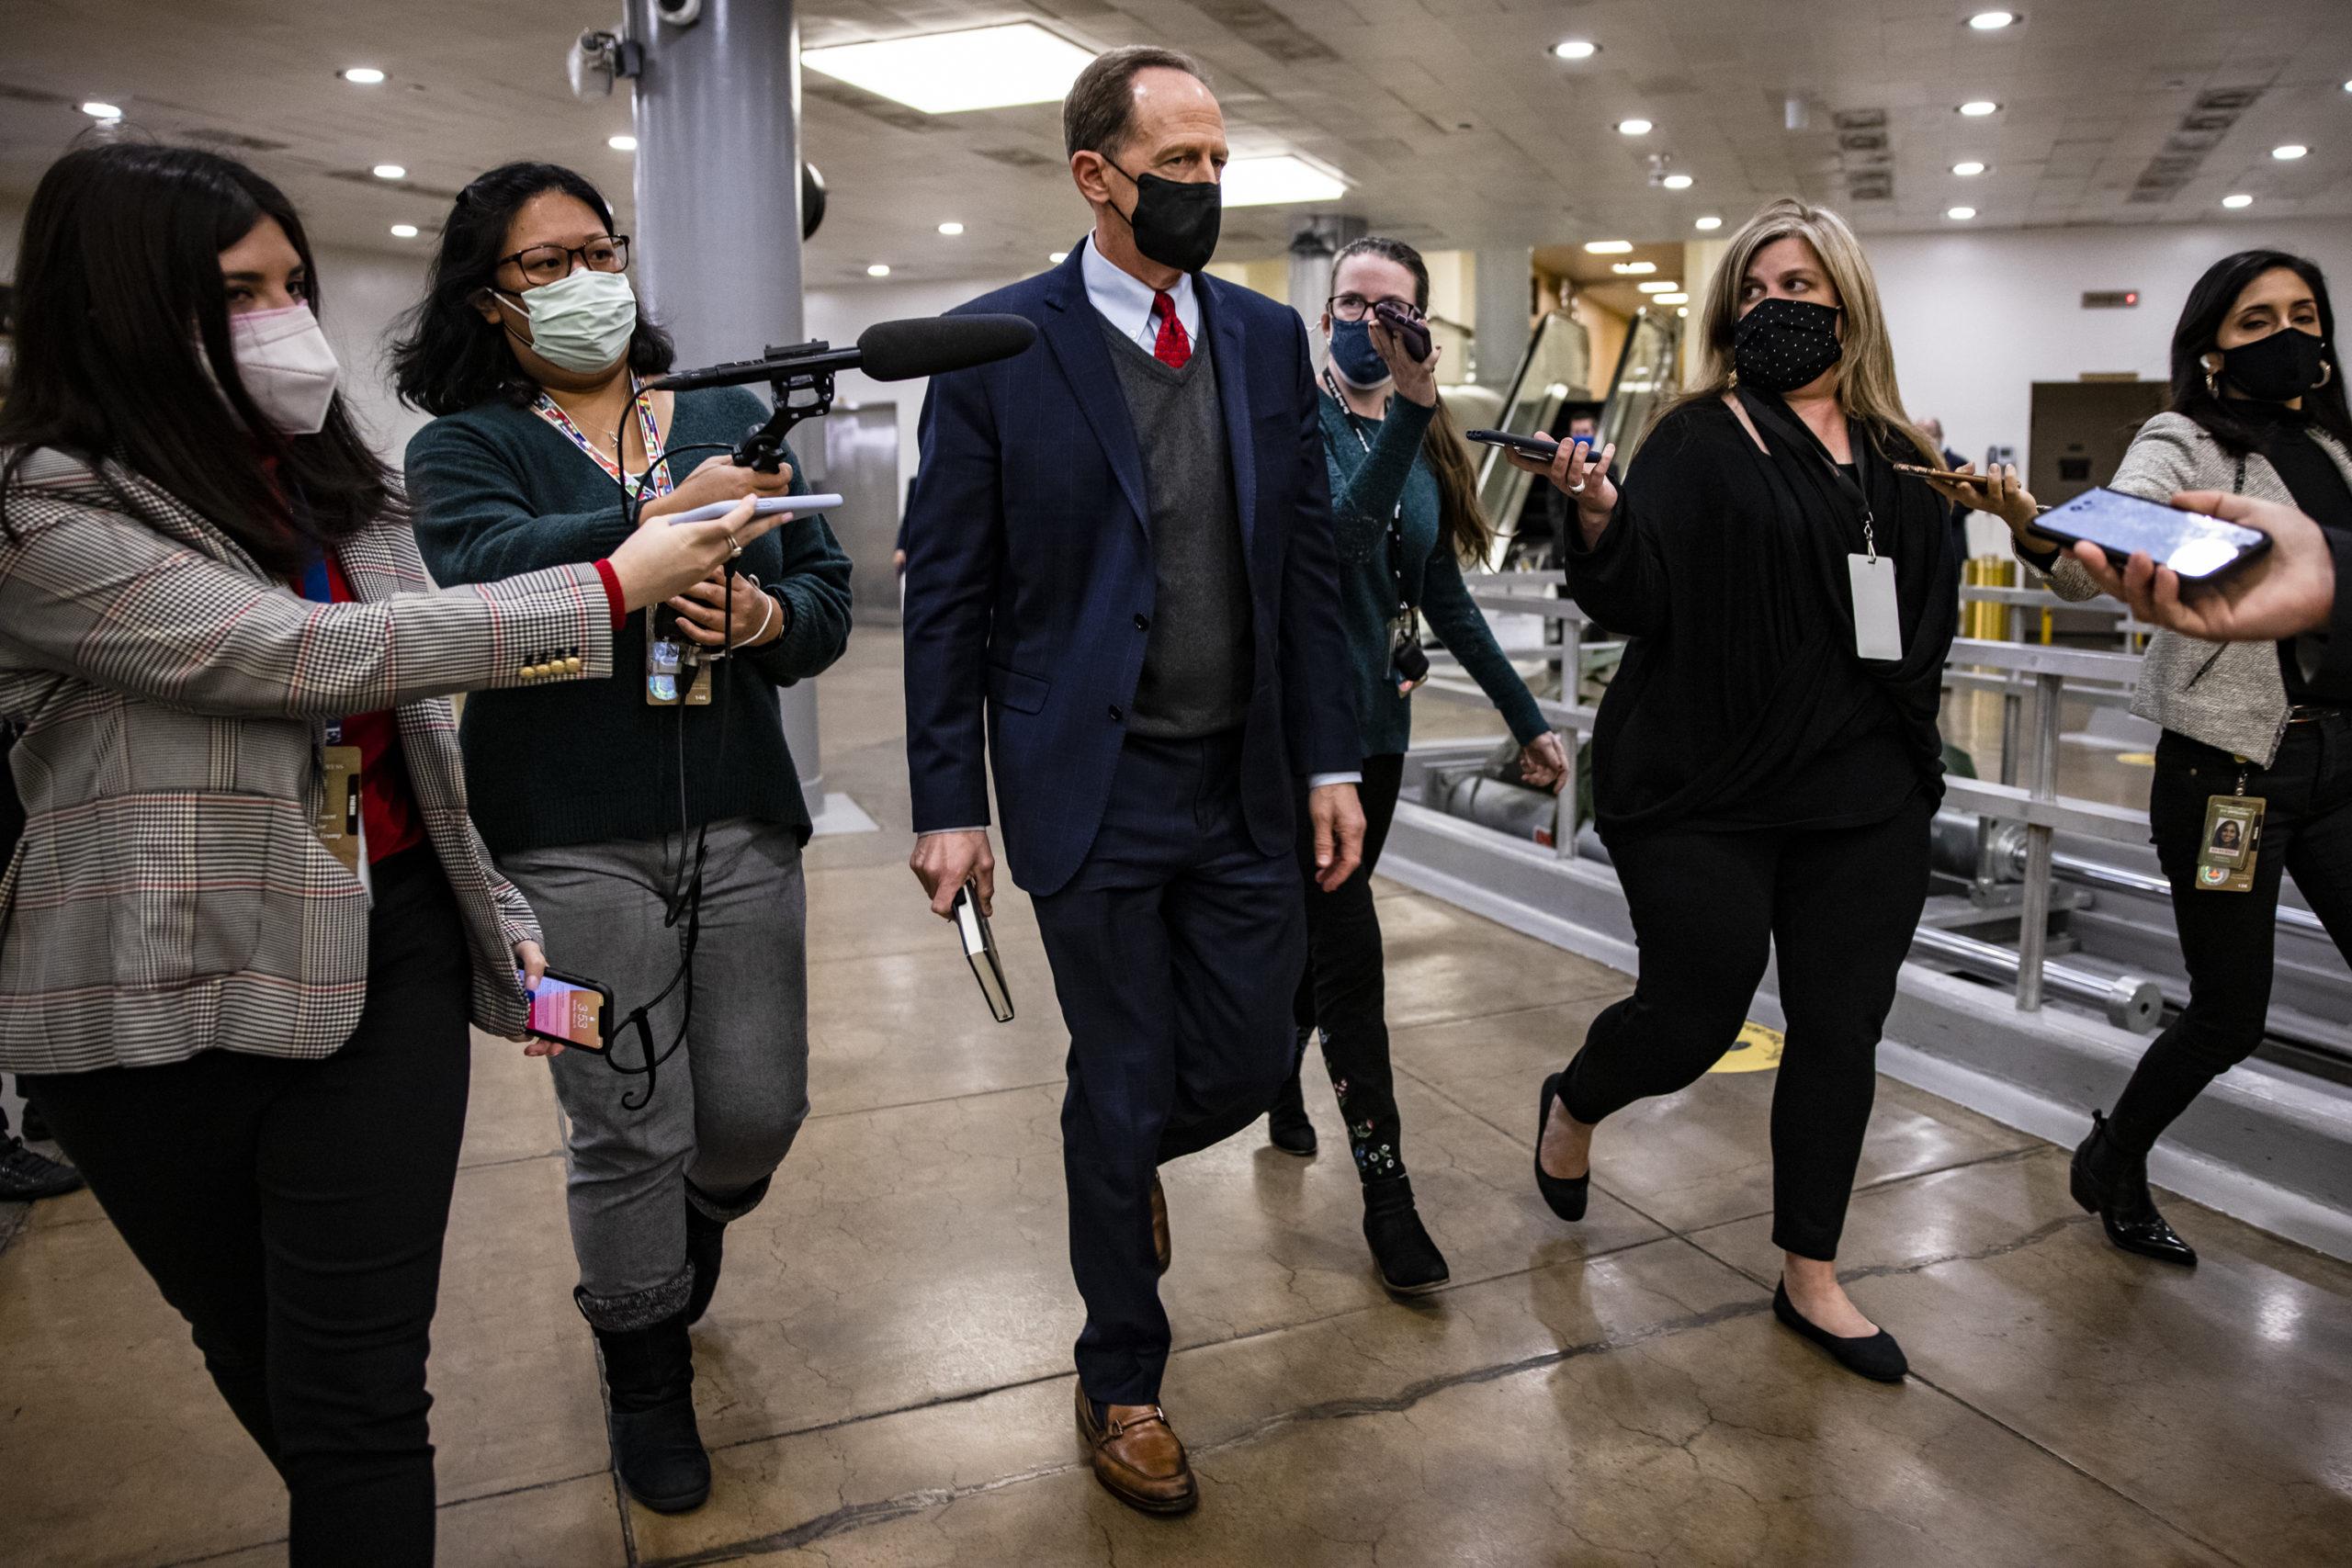 Sen. Pat Toomey walks through the Senate subway in February. (Samuel Corum/Getty Images)